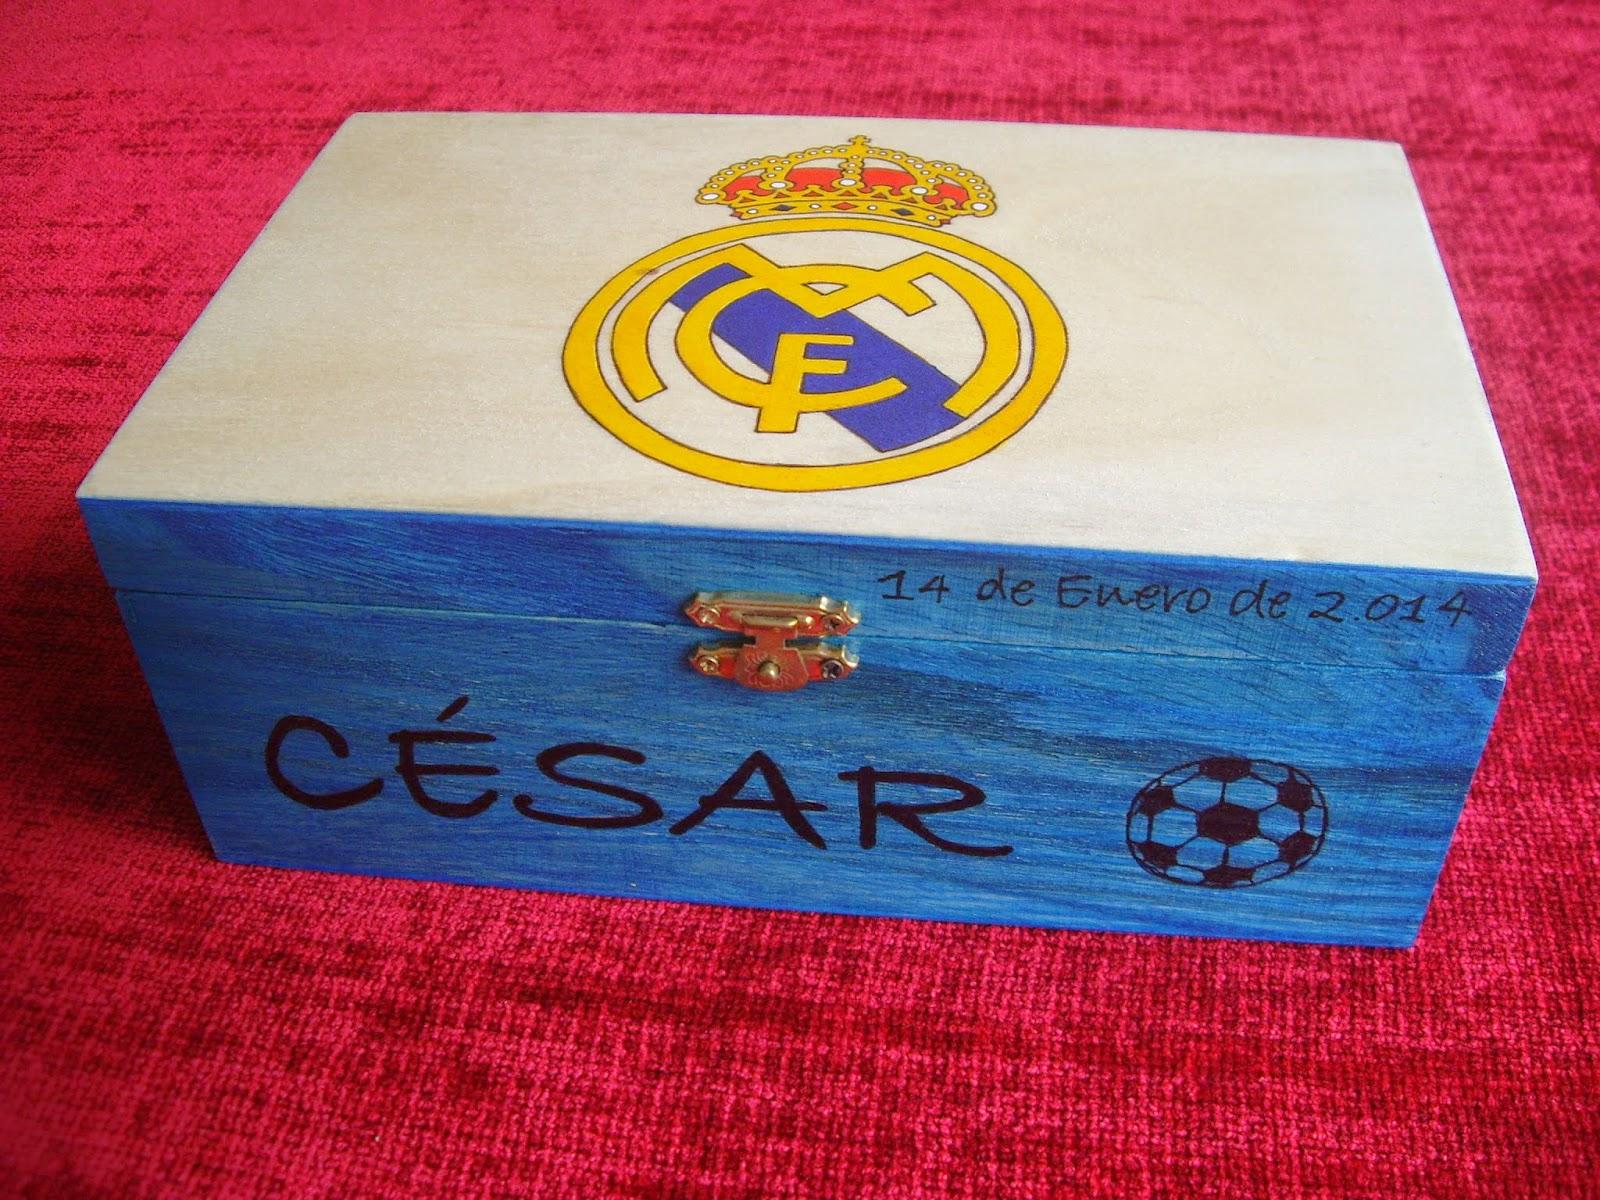 Decol o artesan a caja real madrid - Caja de arquitectos madrid ...